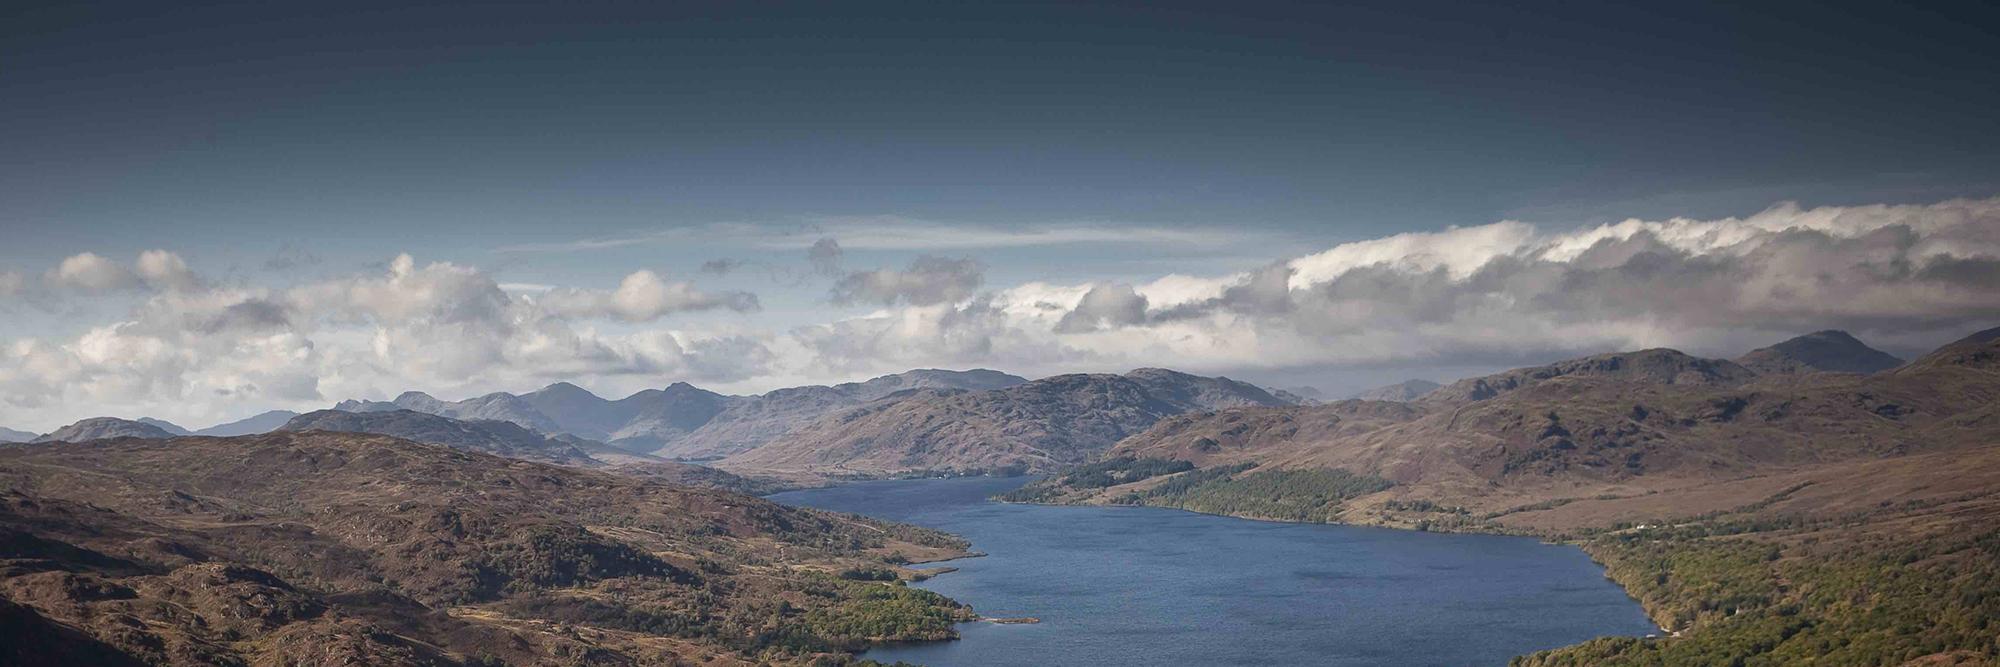 Ben A'an overlooking Loch Katrine, (c)Loch Lomond & The Trossachs National Park